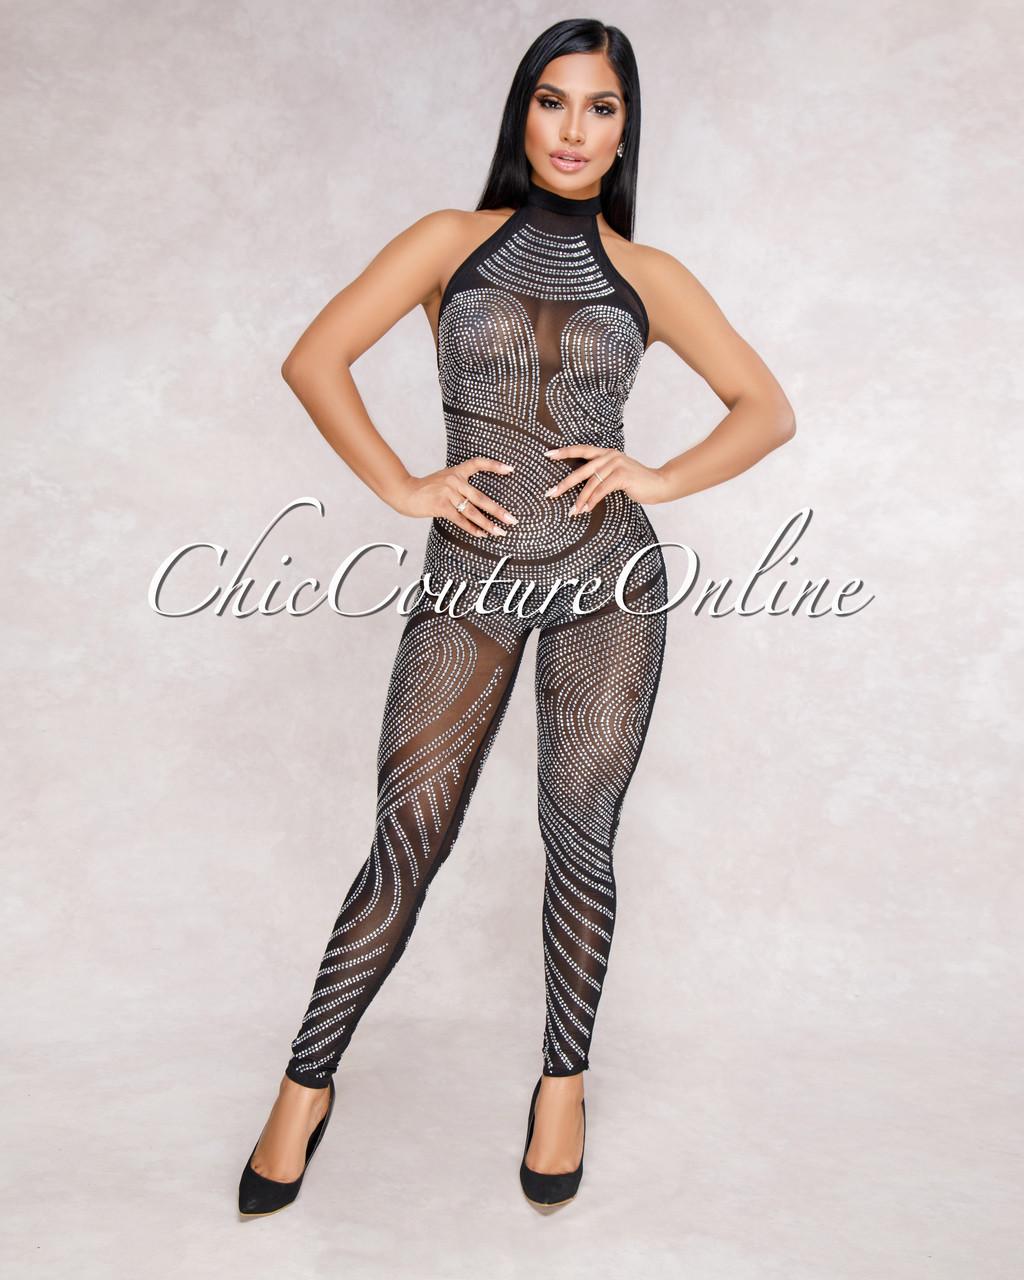 cfd869aea0e Estrella Black Rhinestones Embellished Sheer Halter Jumpsuit. Price    75.00. Image 1